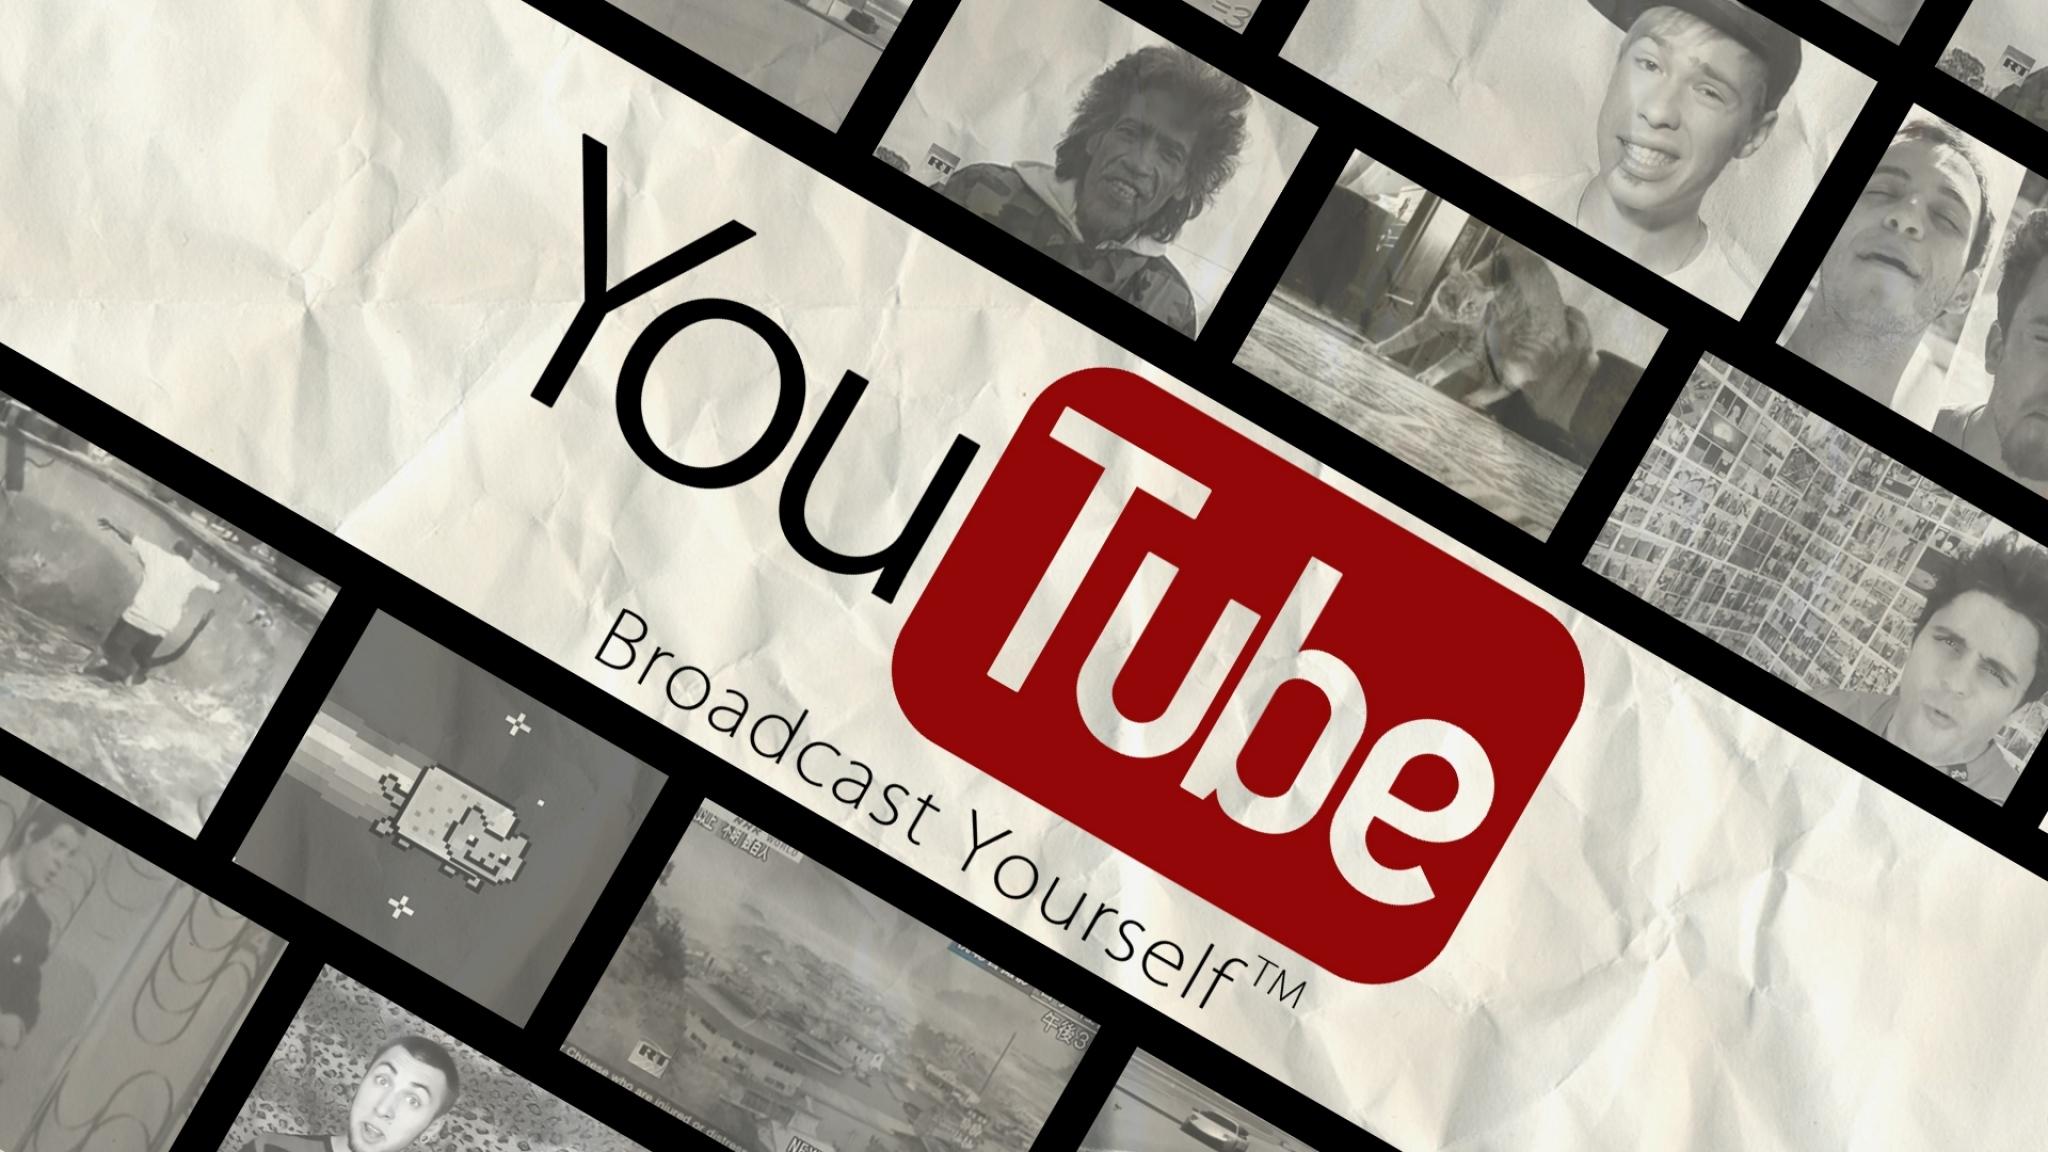 Illustrez votre chaîne Youtube